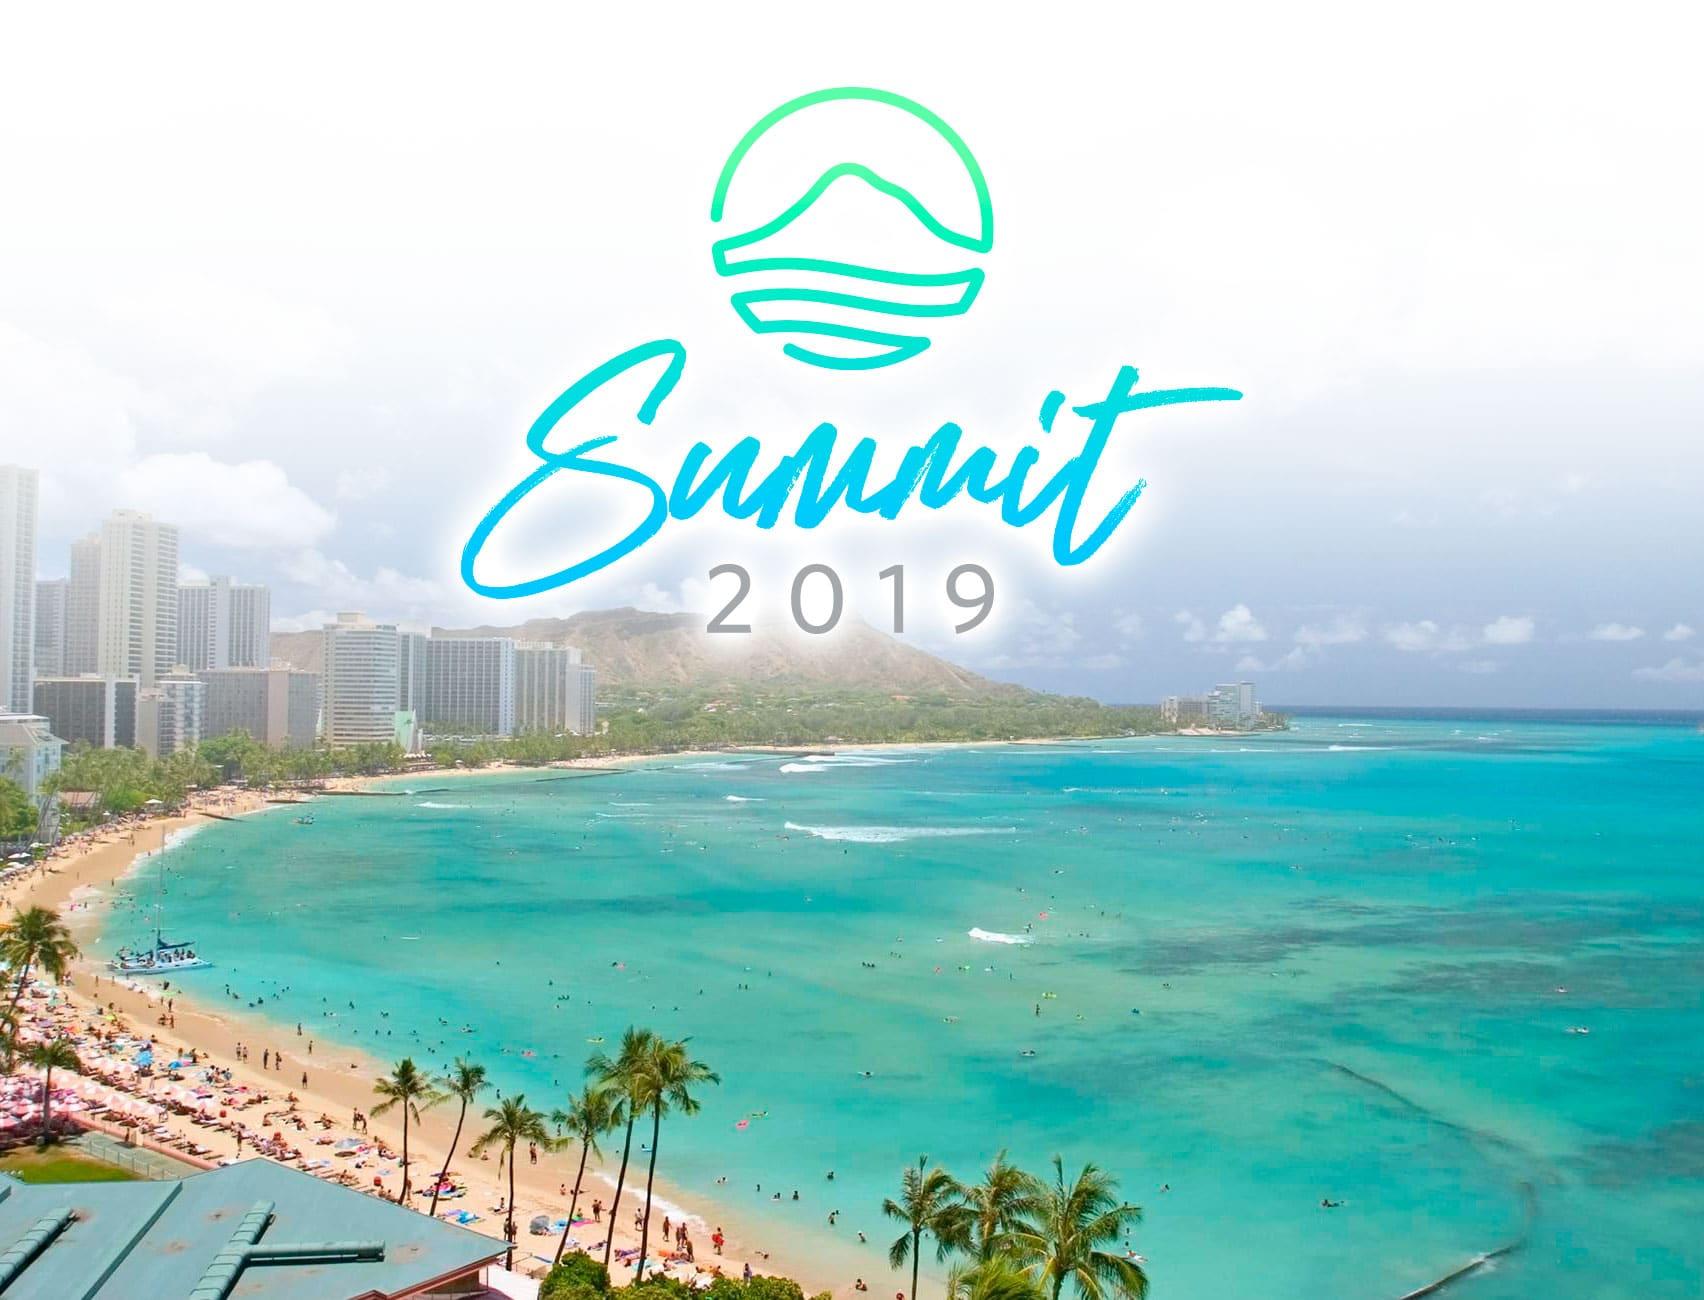 Silhouette Summit 2019